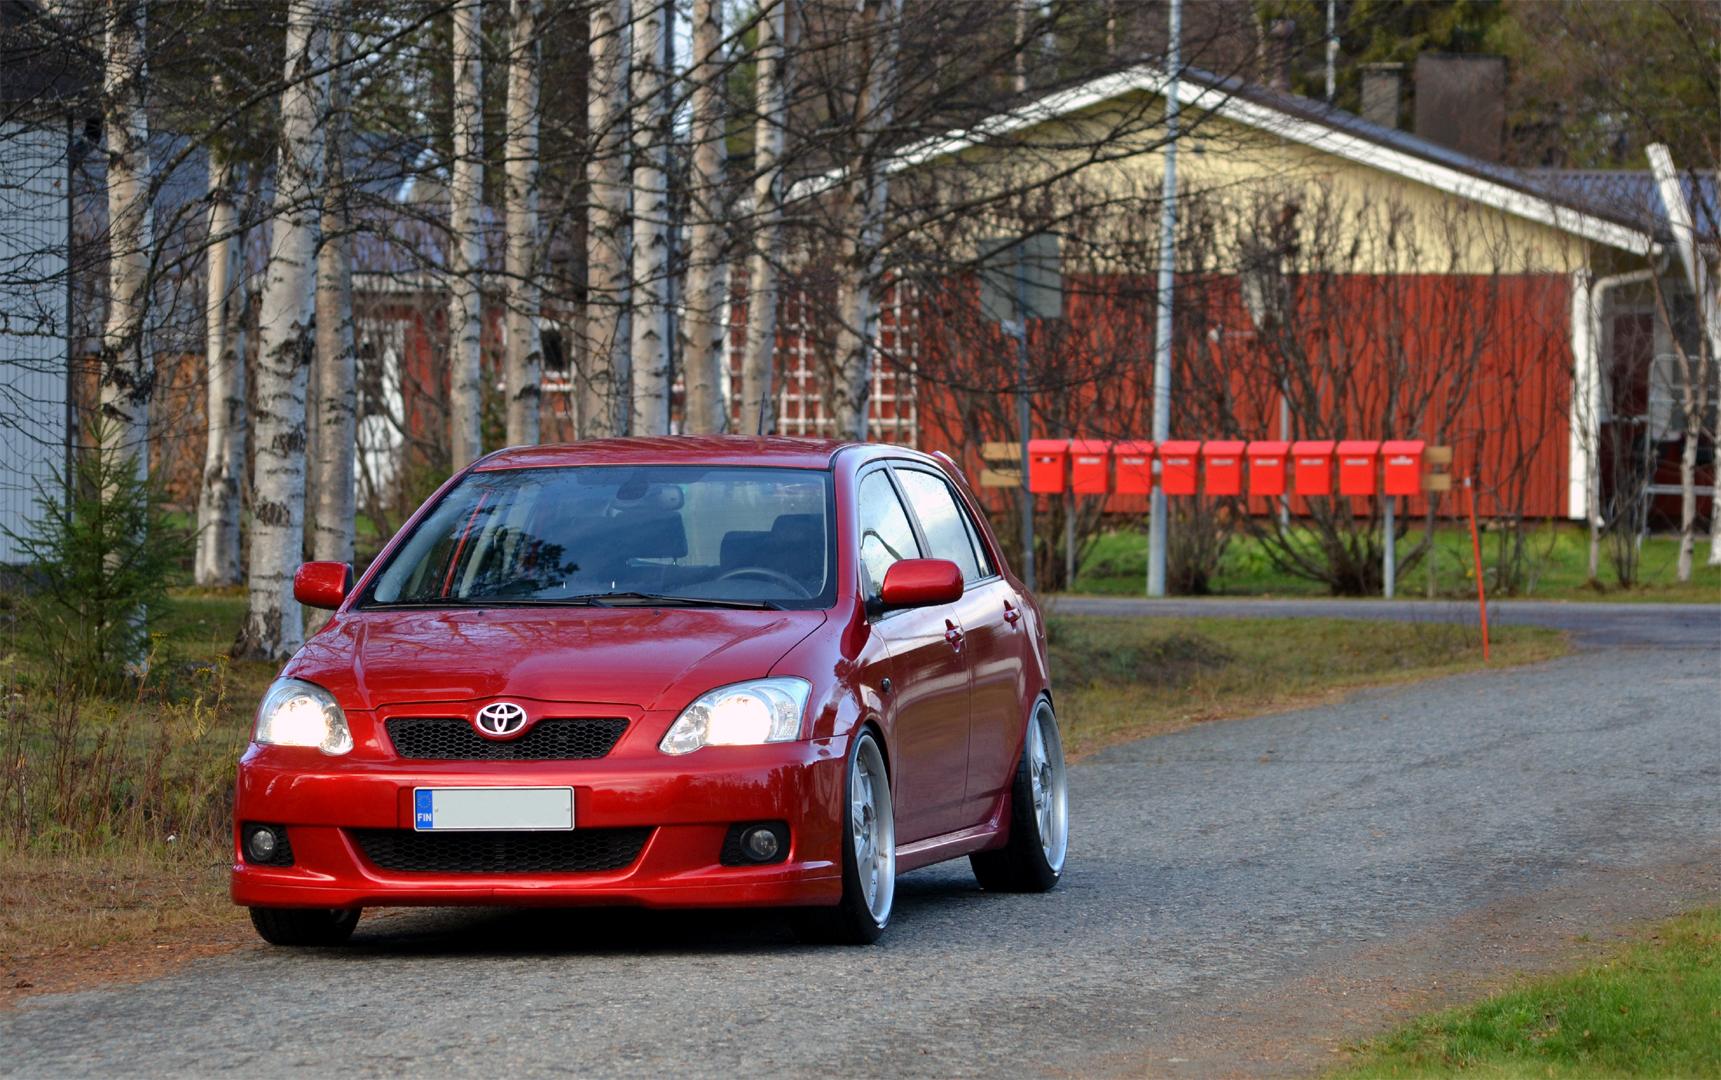 Japtoys & Fittest presents: Mysticin Toyota Corolla E12 Dsc0487qm